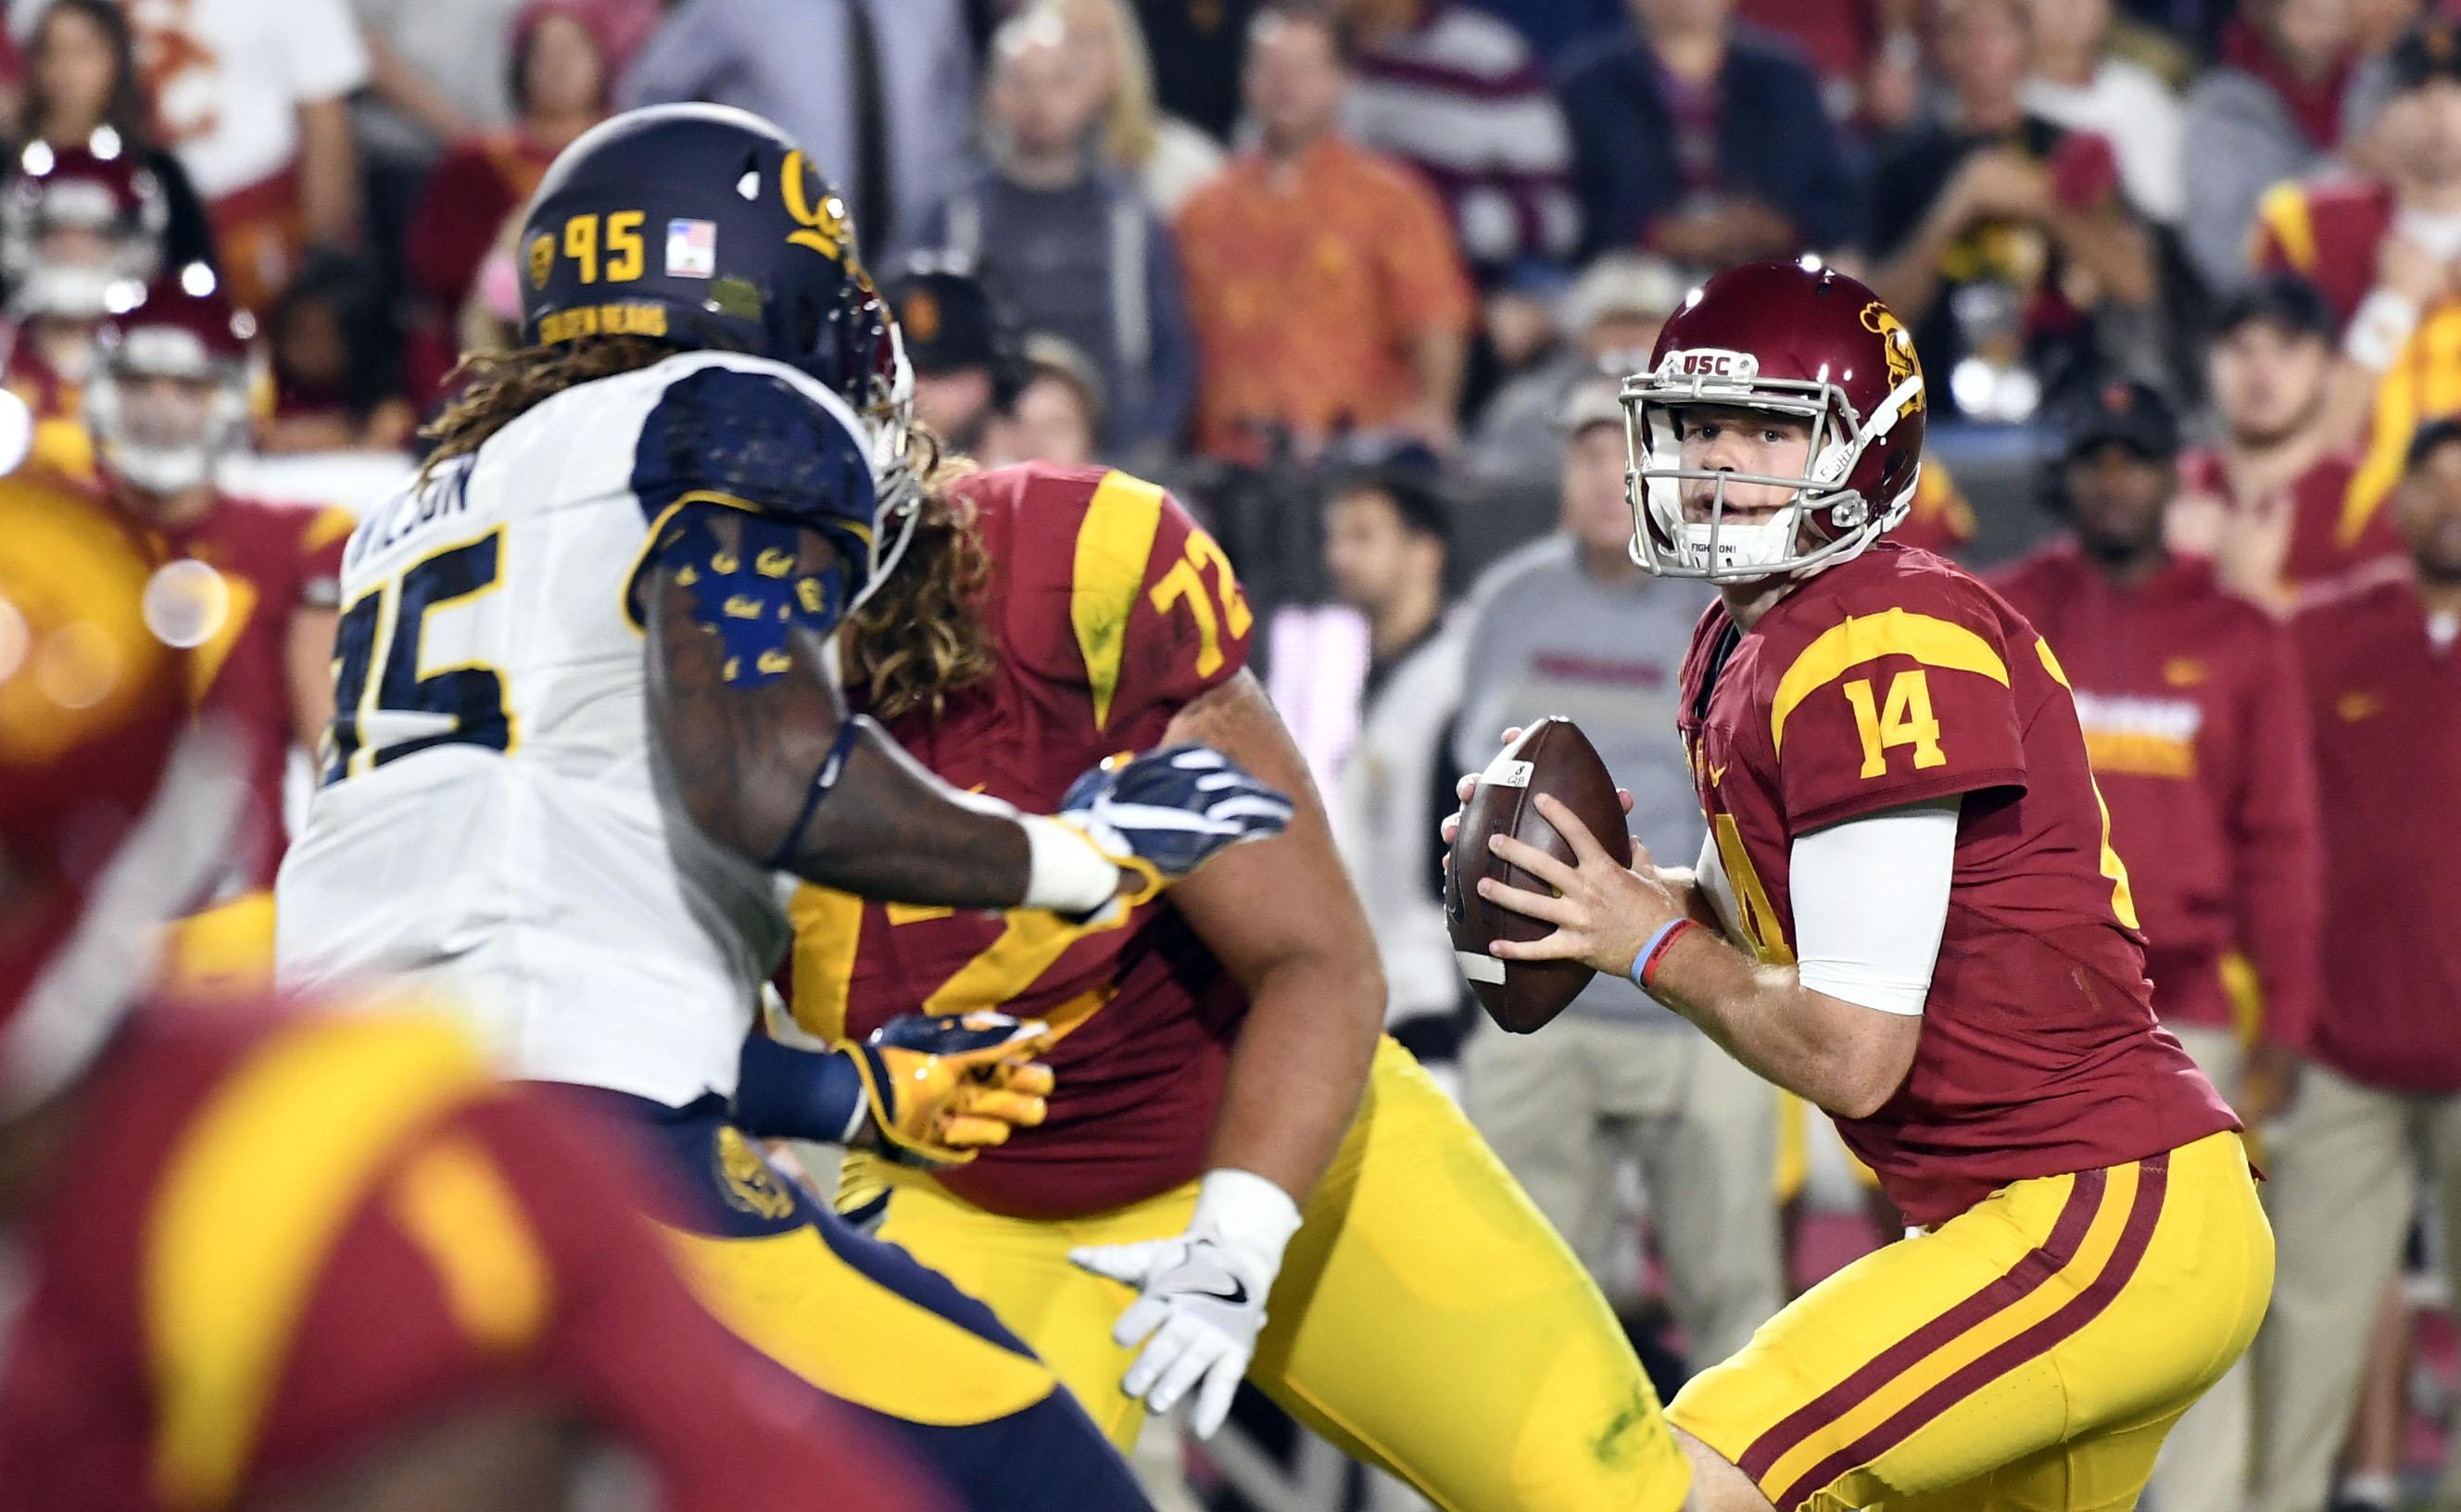 Jones, Darnold power USC to 45-20 win over Oregon